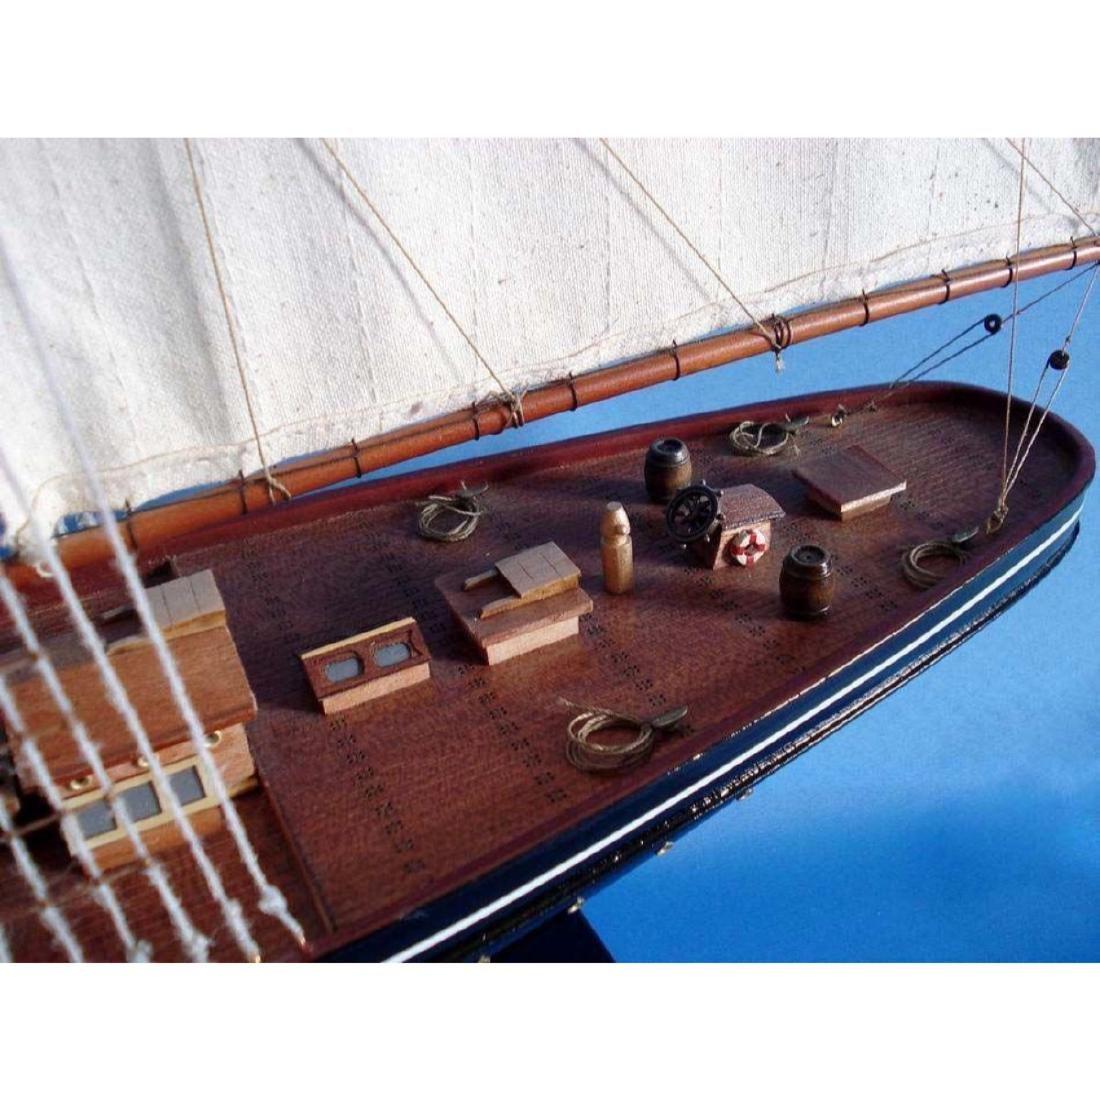 "Wooden Atlantic Limited Model Sailboat 32"" - 10"